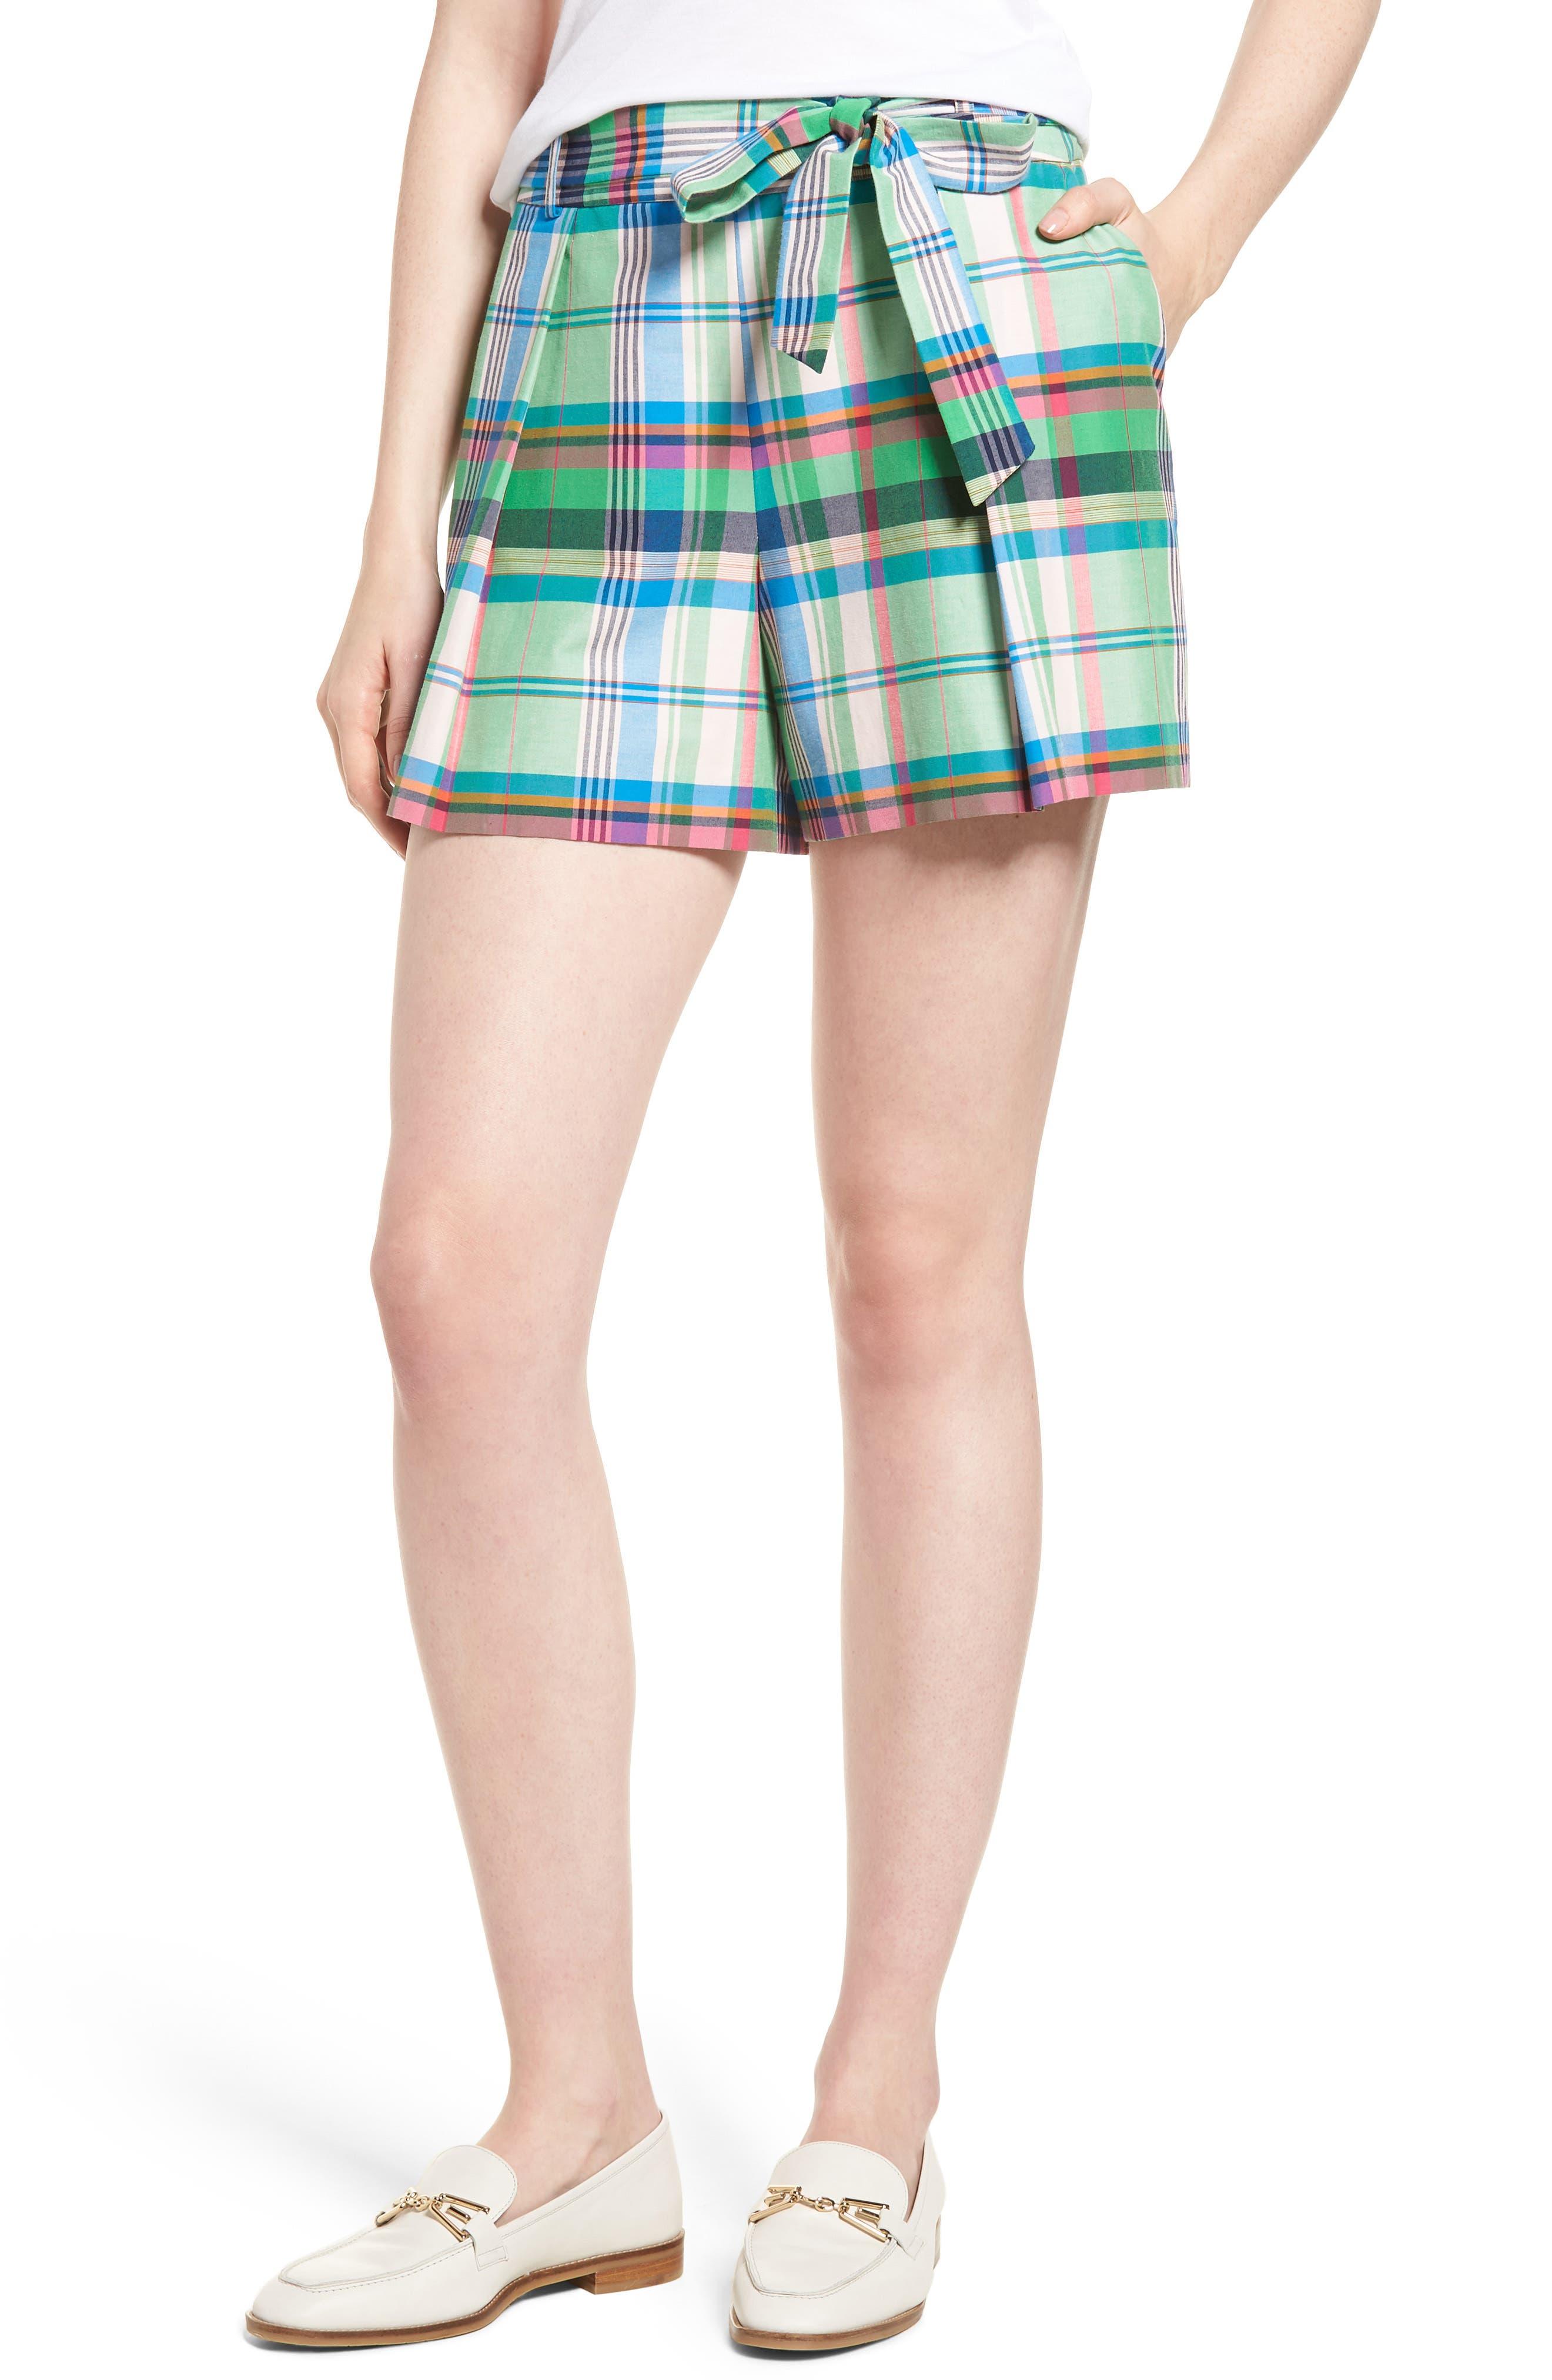 Alternate Image 1 Selected - 1901 Pleated Plaid Shorts